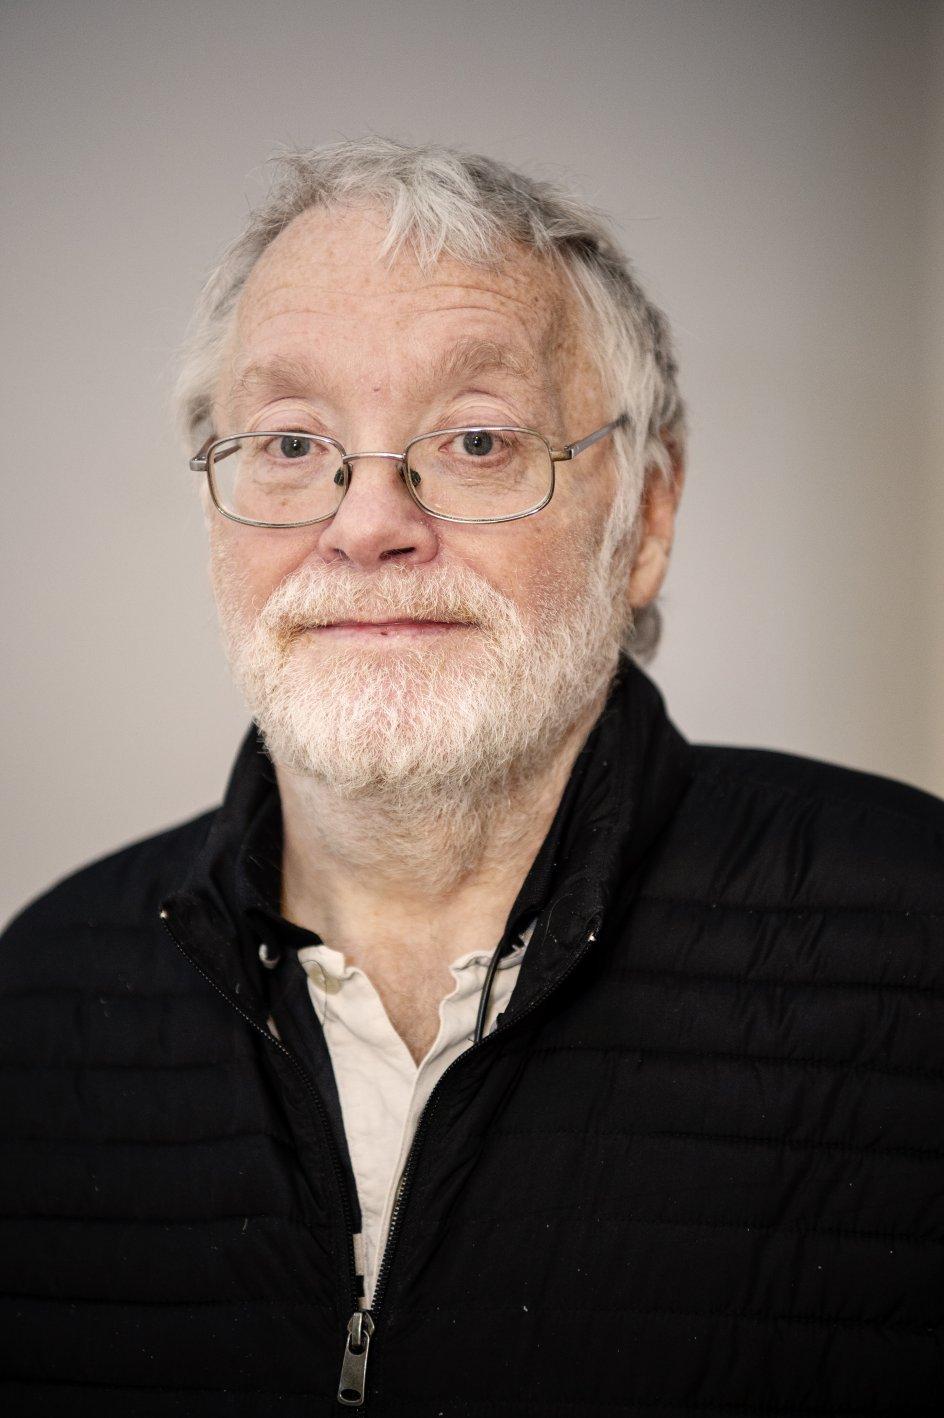 Det Etiske Kompas, Program 6. Live fra Kristeligt Dagblads kantine. Voxpop: Michael Hansen, 67 år og bor i Hundested.